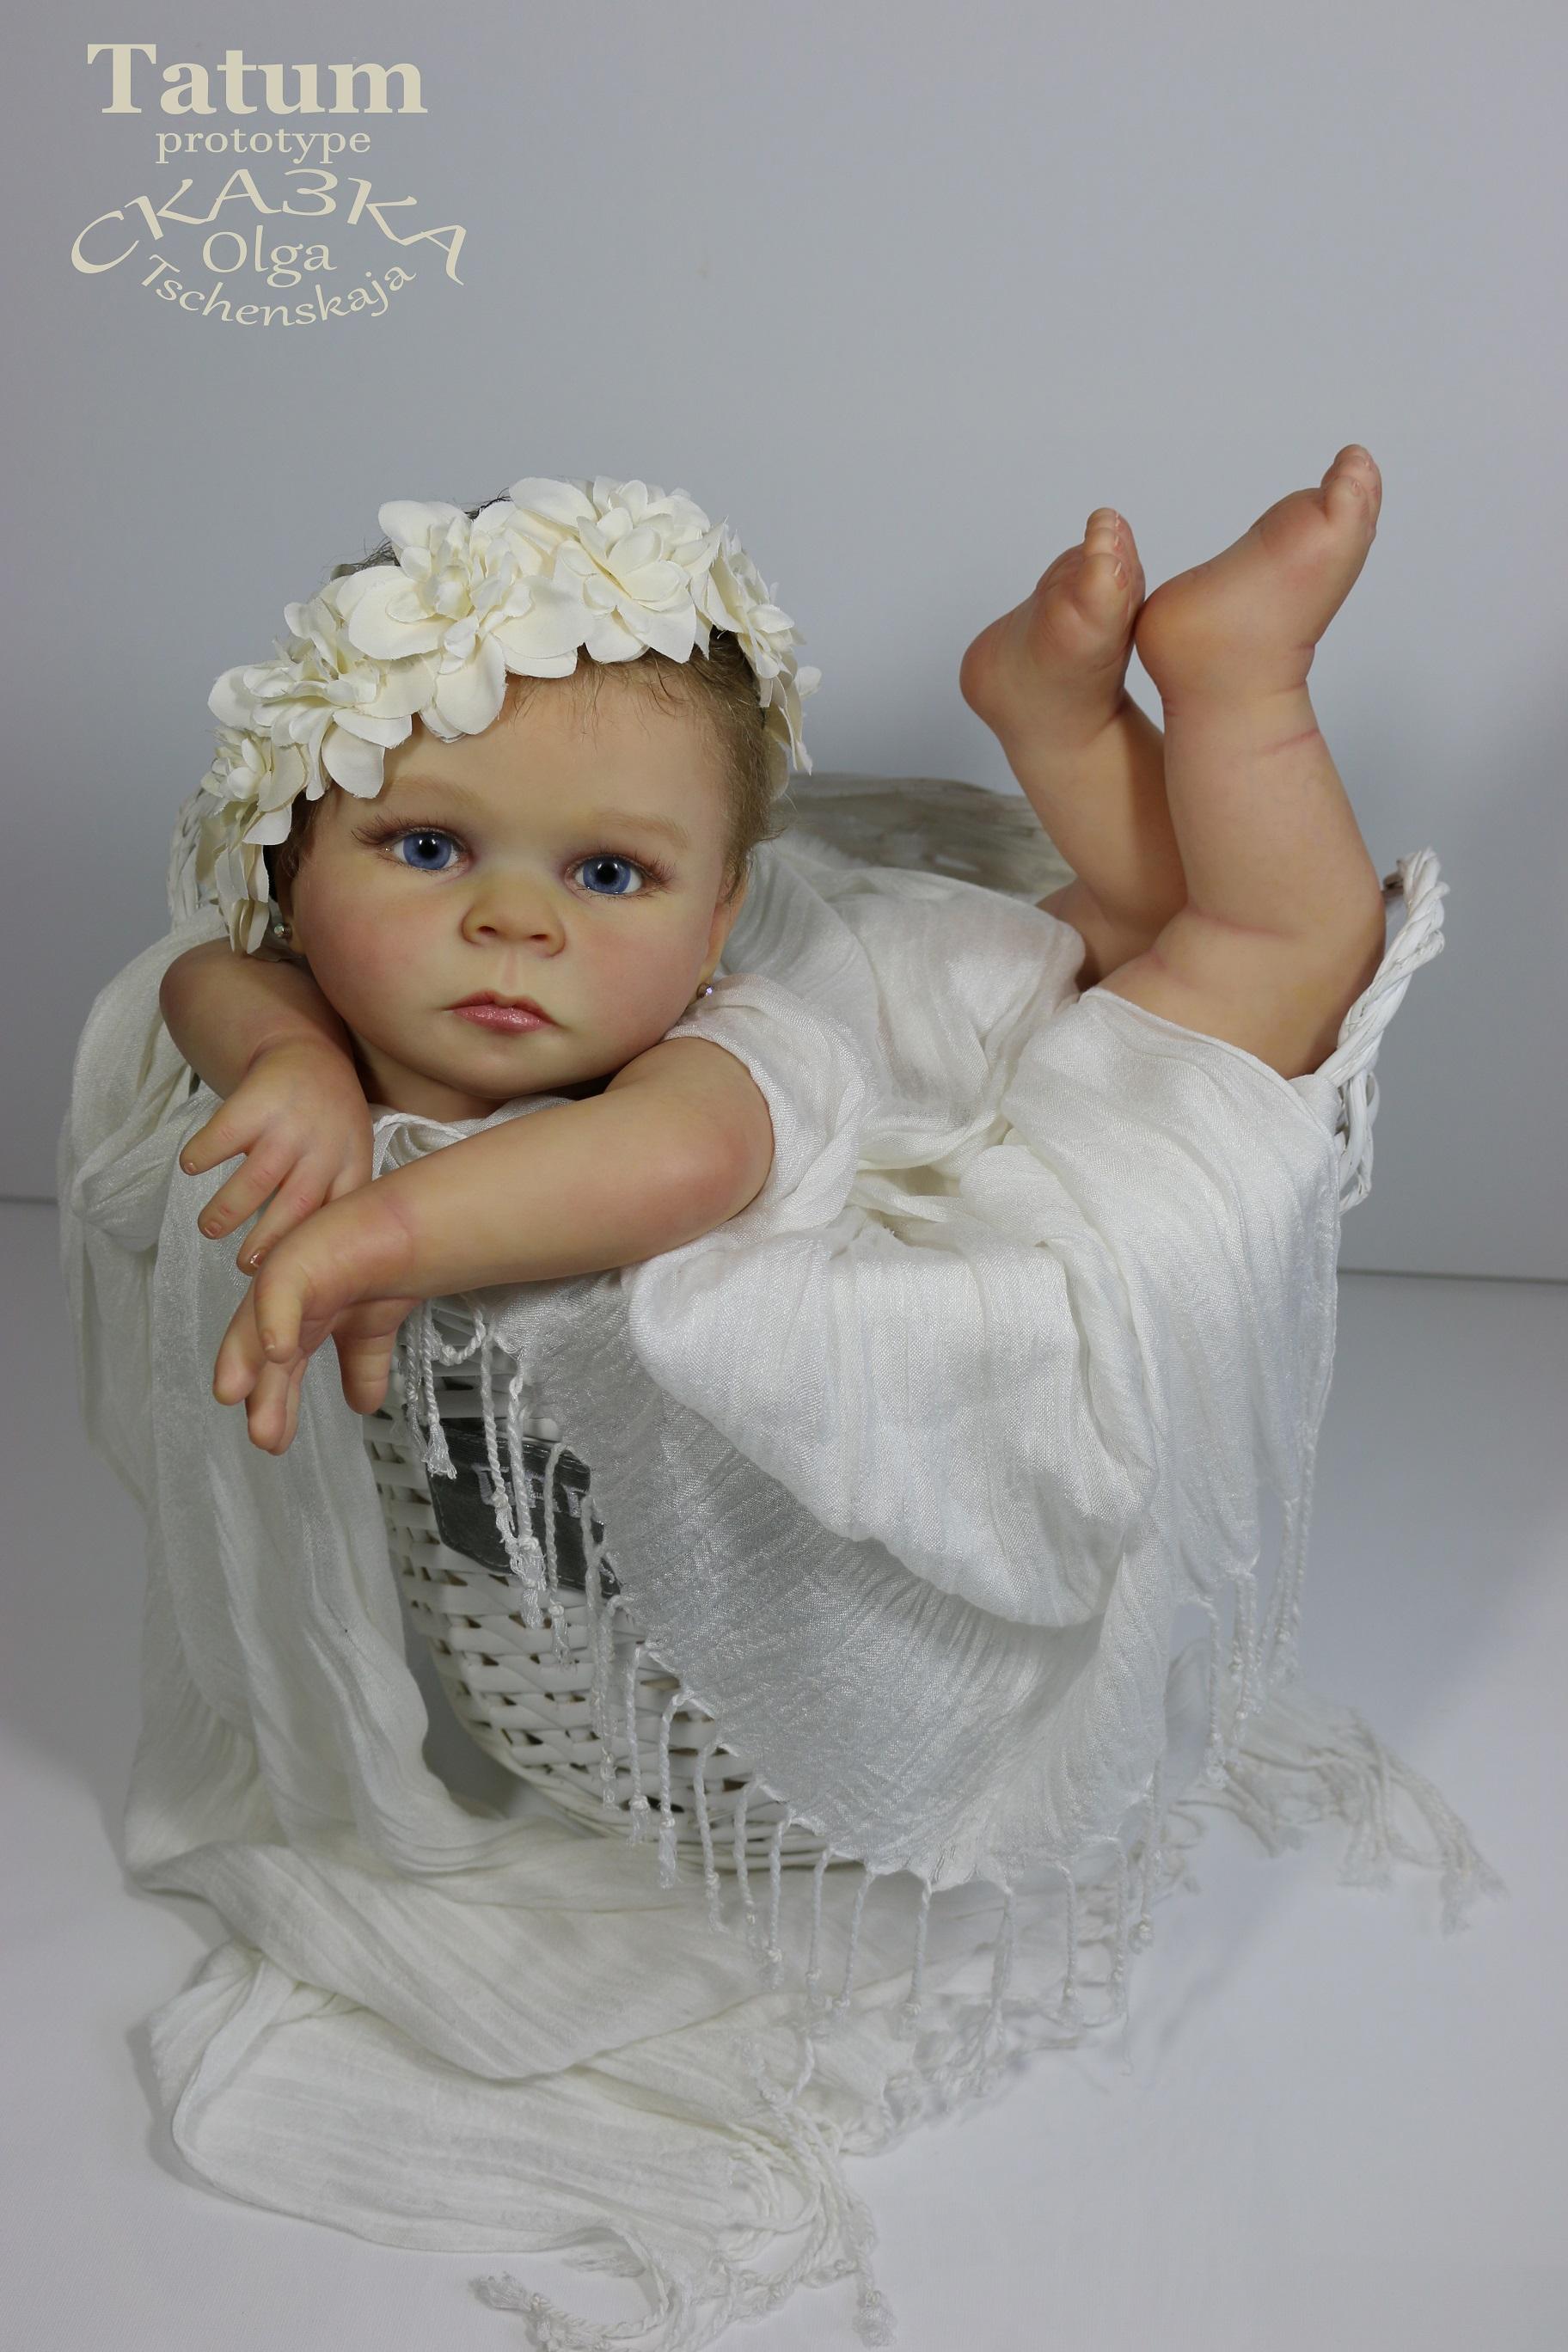 Doll Kit - Tatum